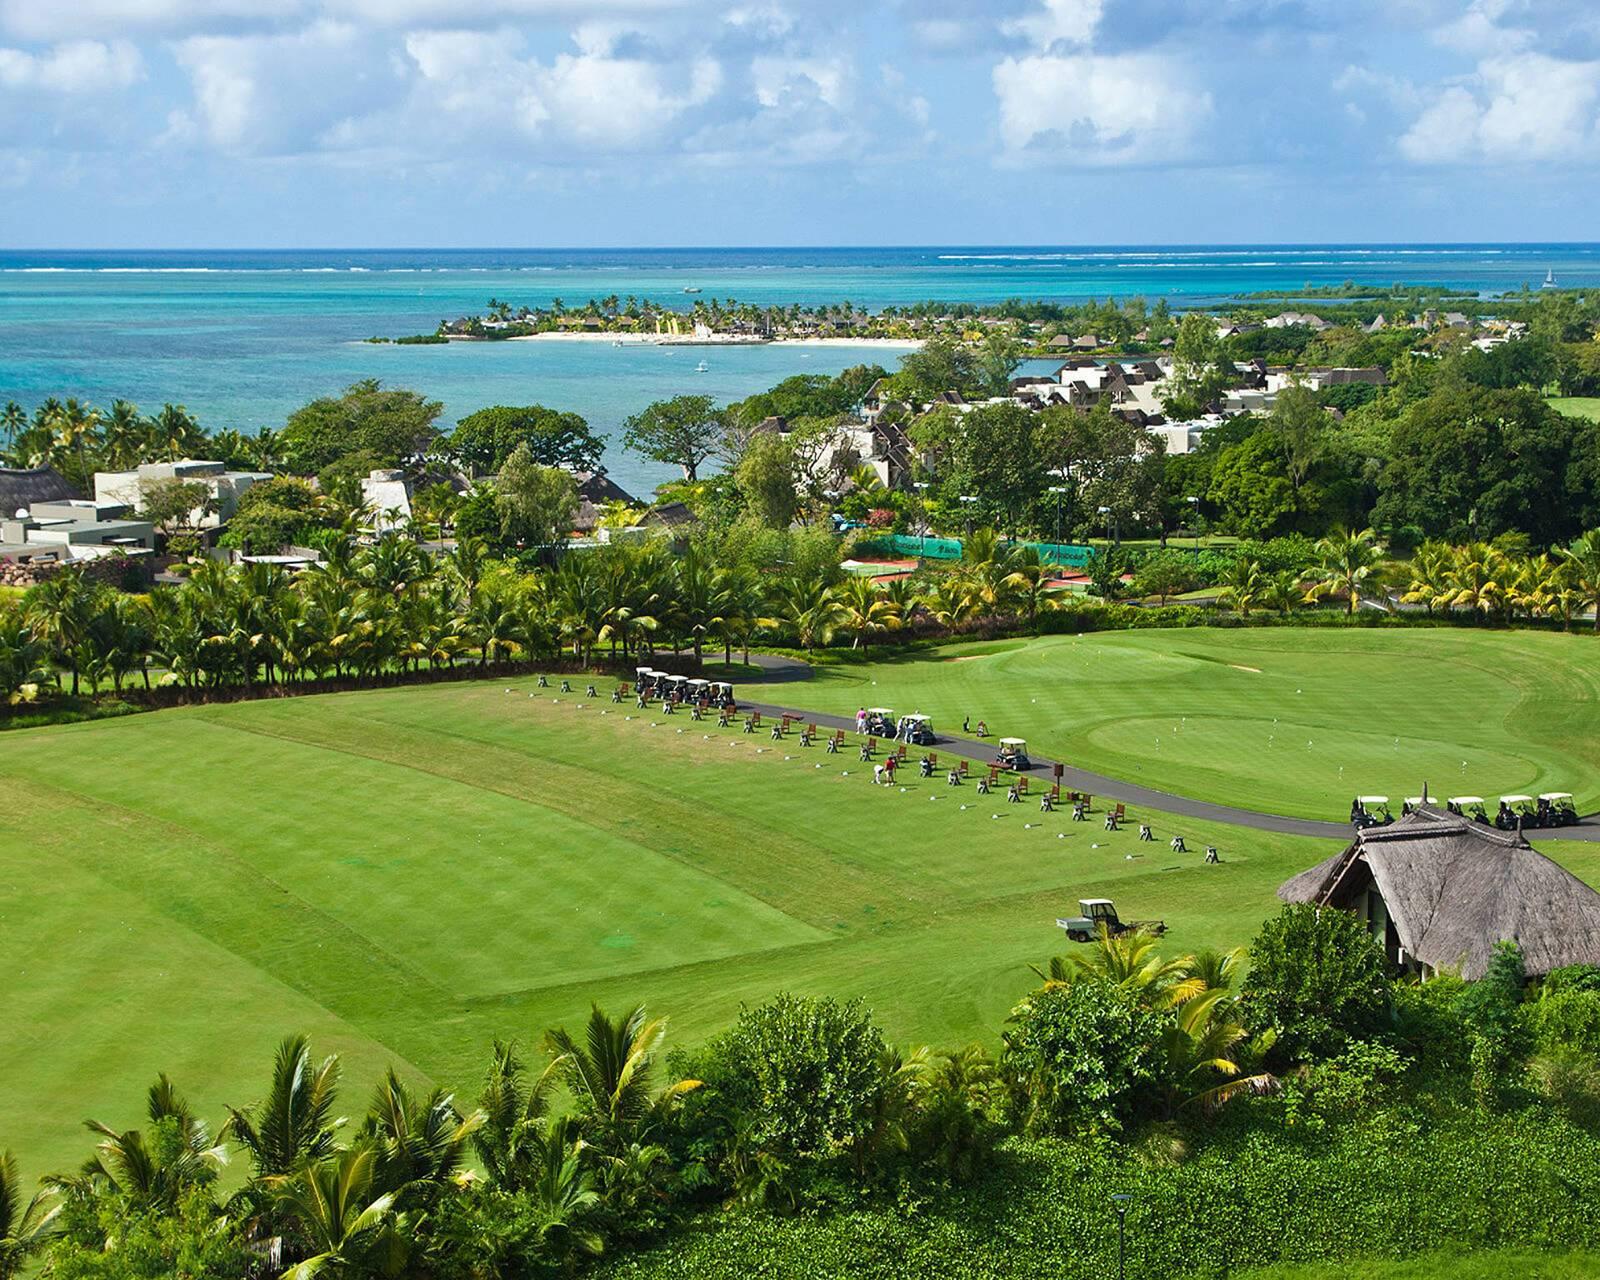 Four Seasons Maurice Anahita Golf Academy